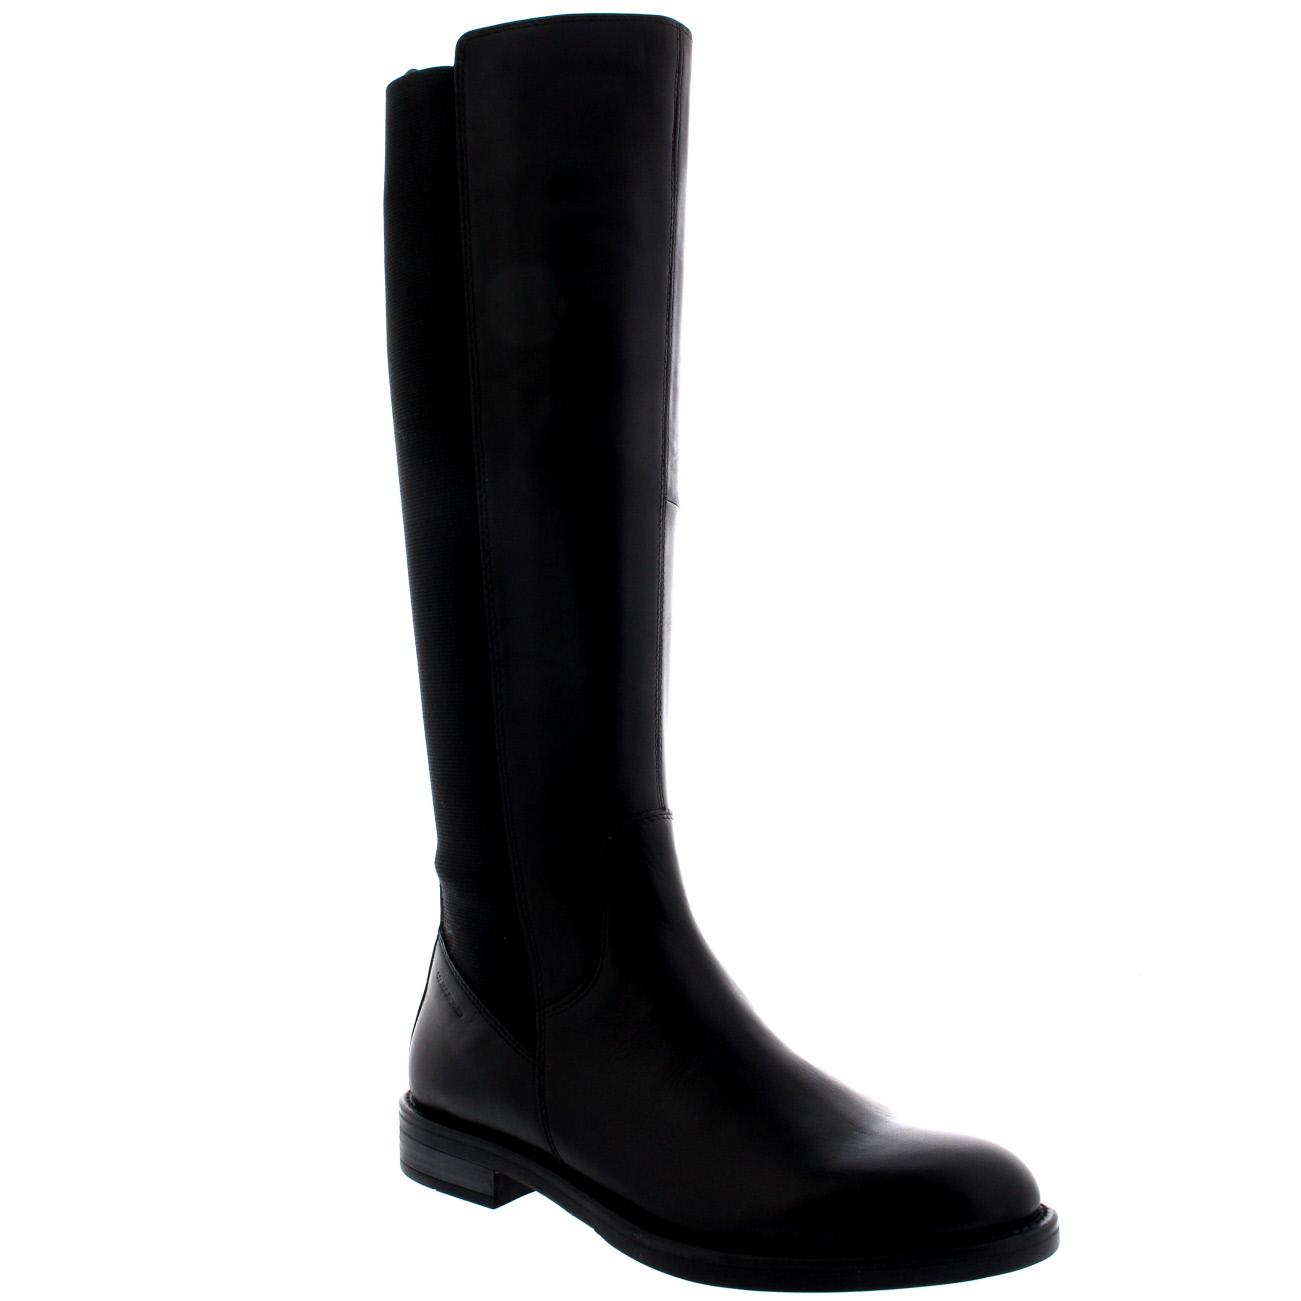 Vagabond Amina Knee High Boots